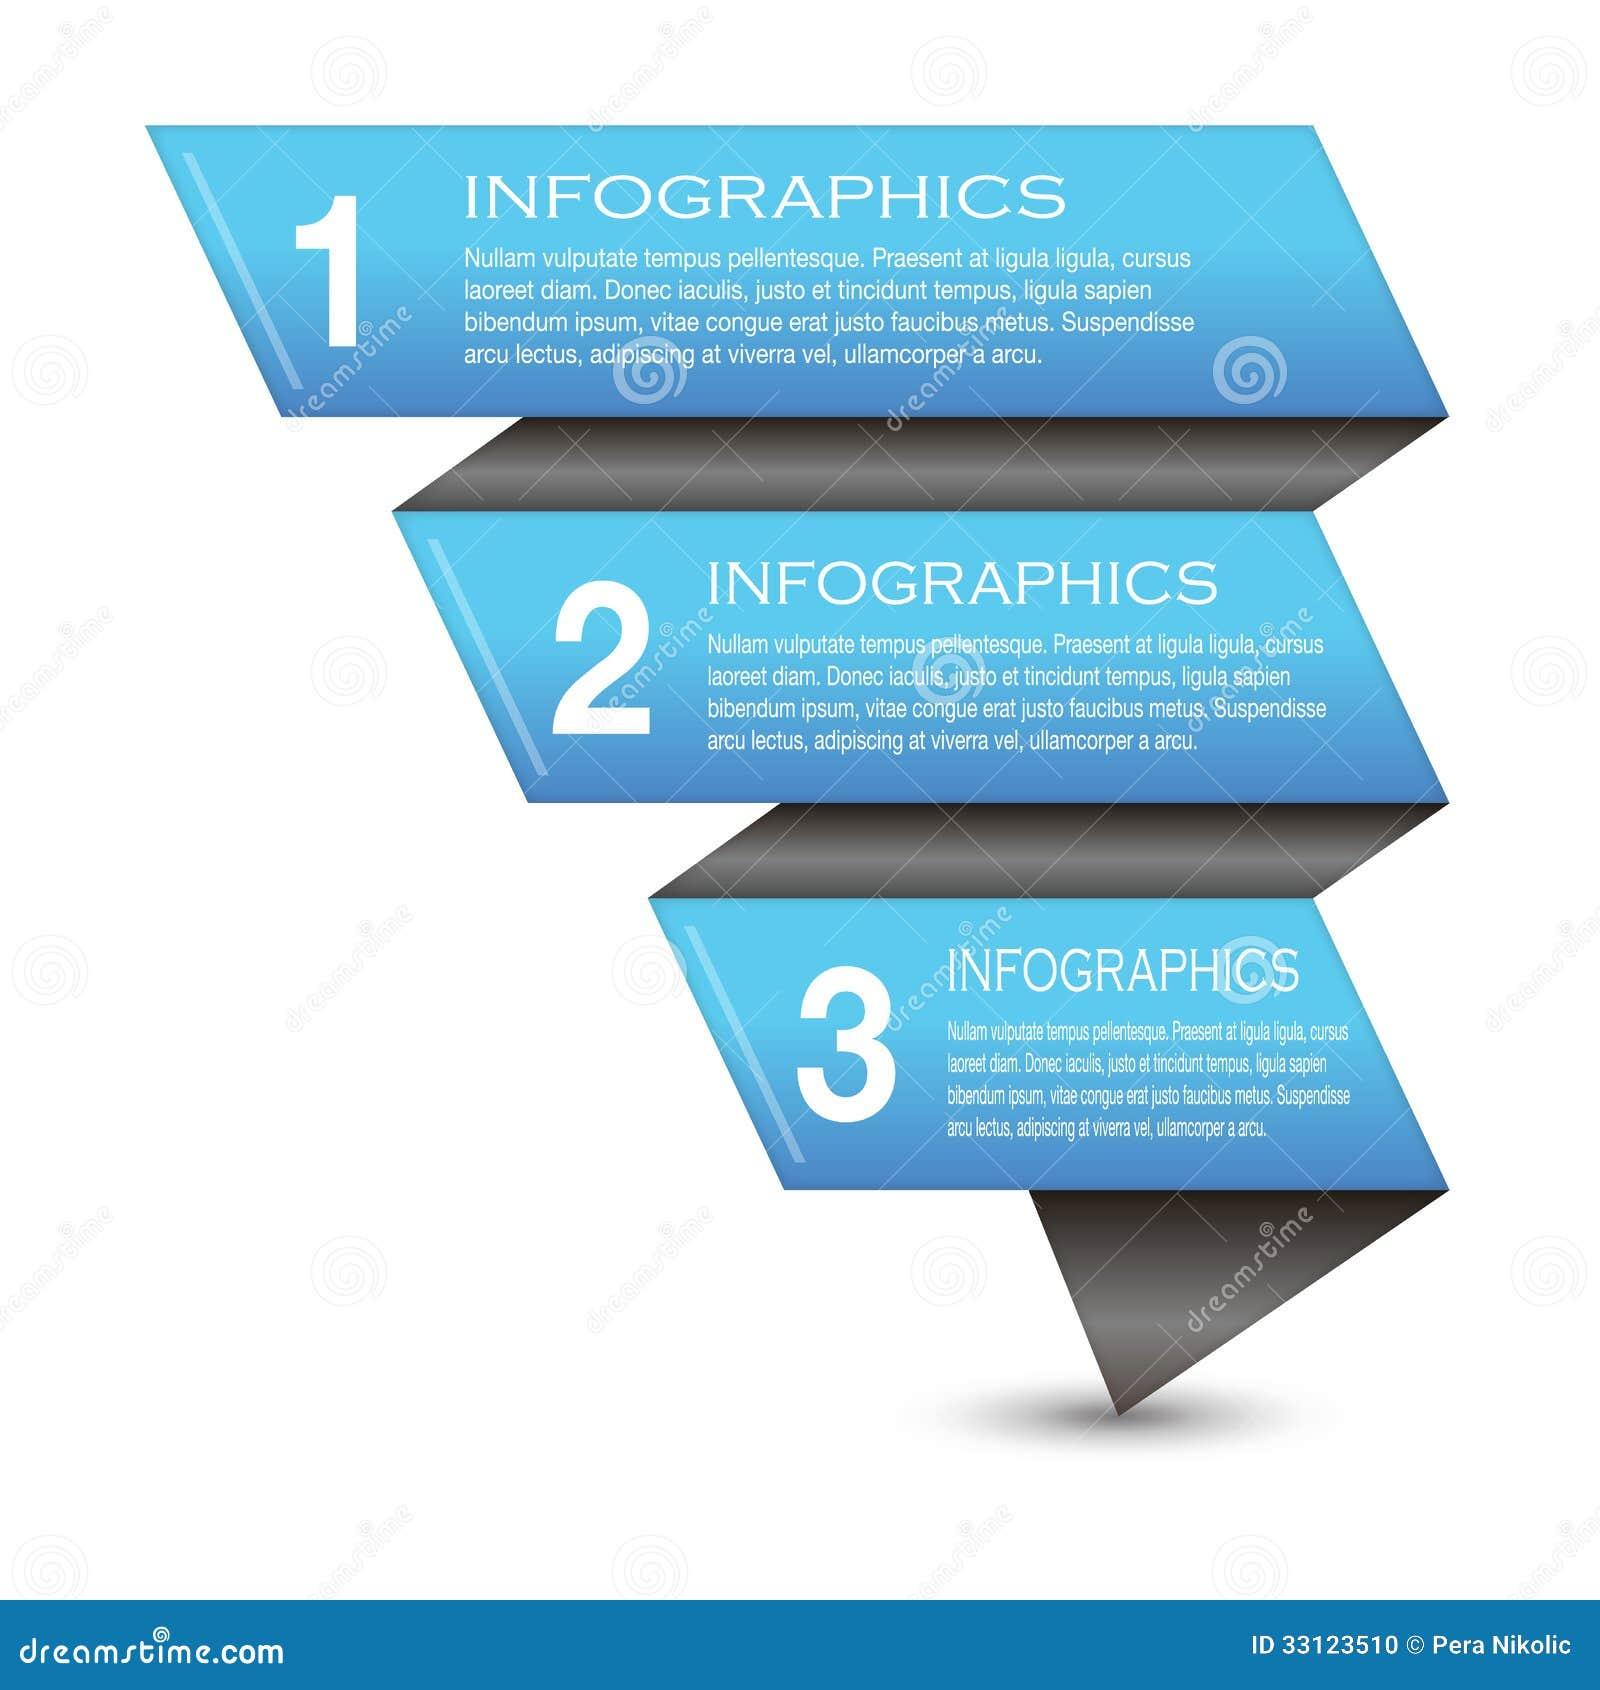 Infographic template google docs